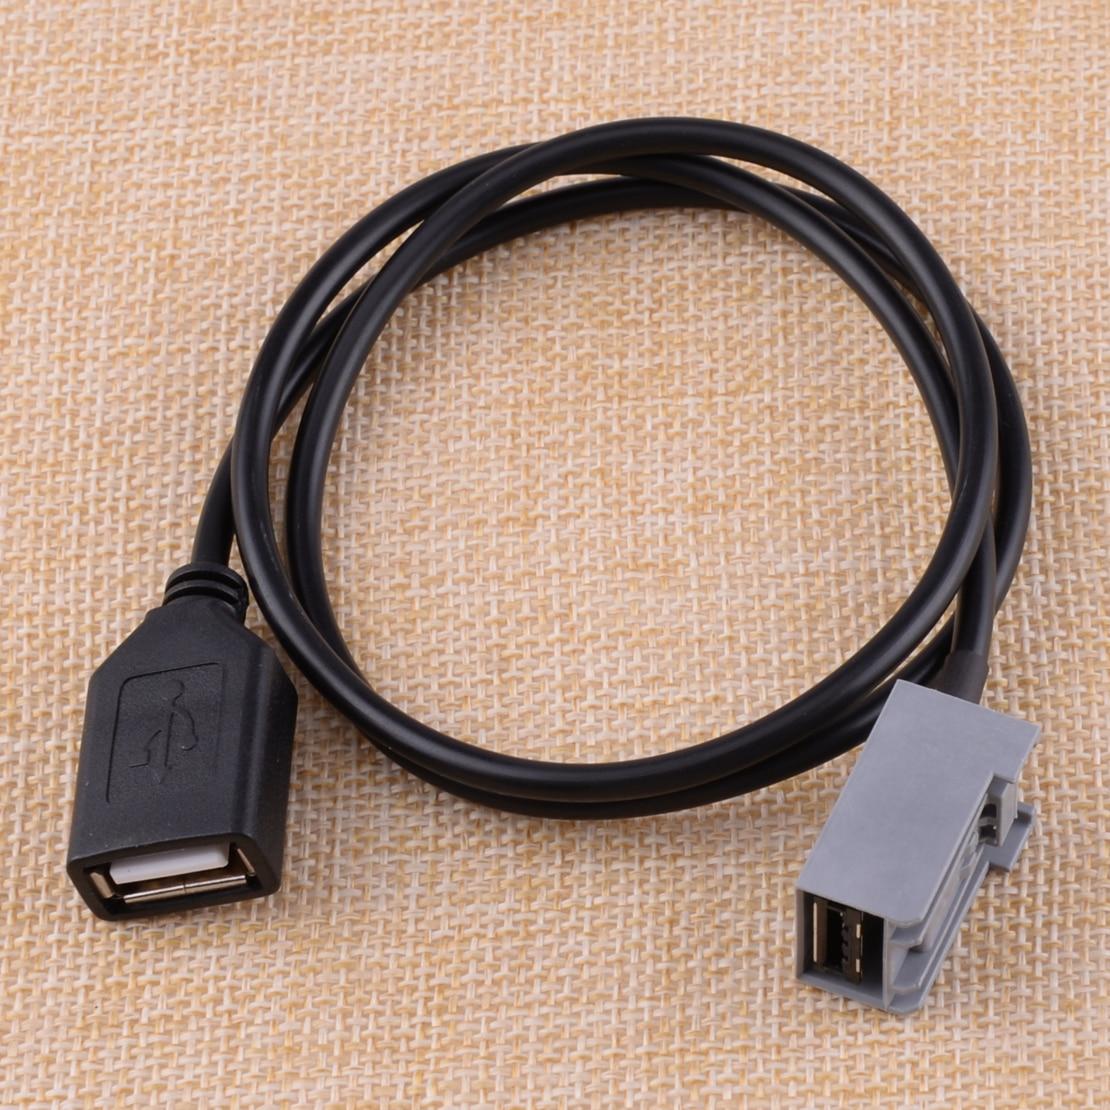 CITALL Авто USB Женский Кабель адаптер AUX порт Подходит для Honda Civic Jazz CR-V Accord Odyssey 2009 2010 2011 2012 2013